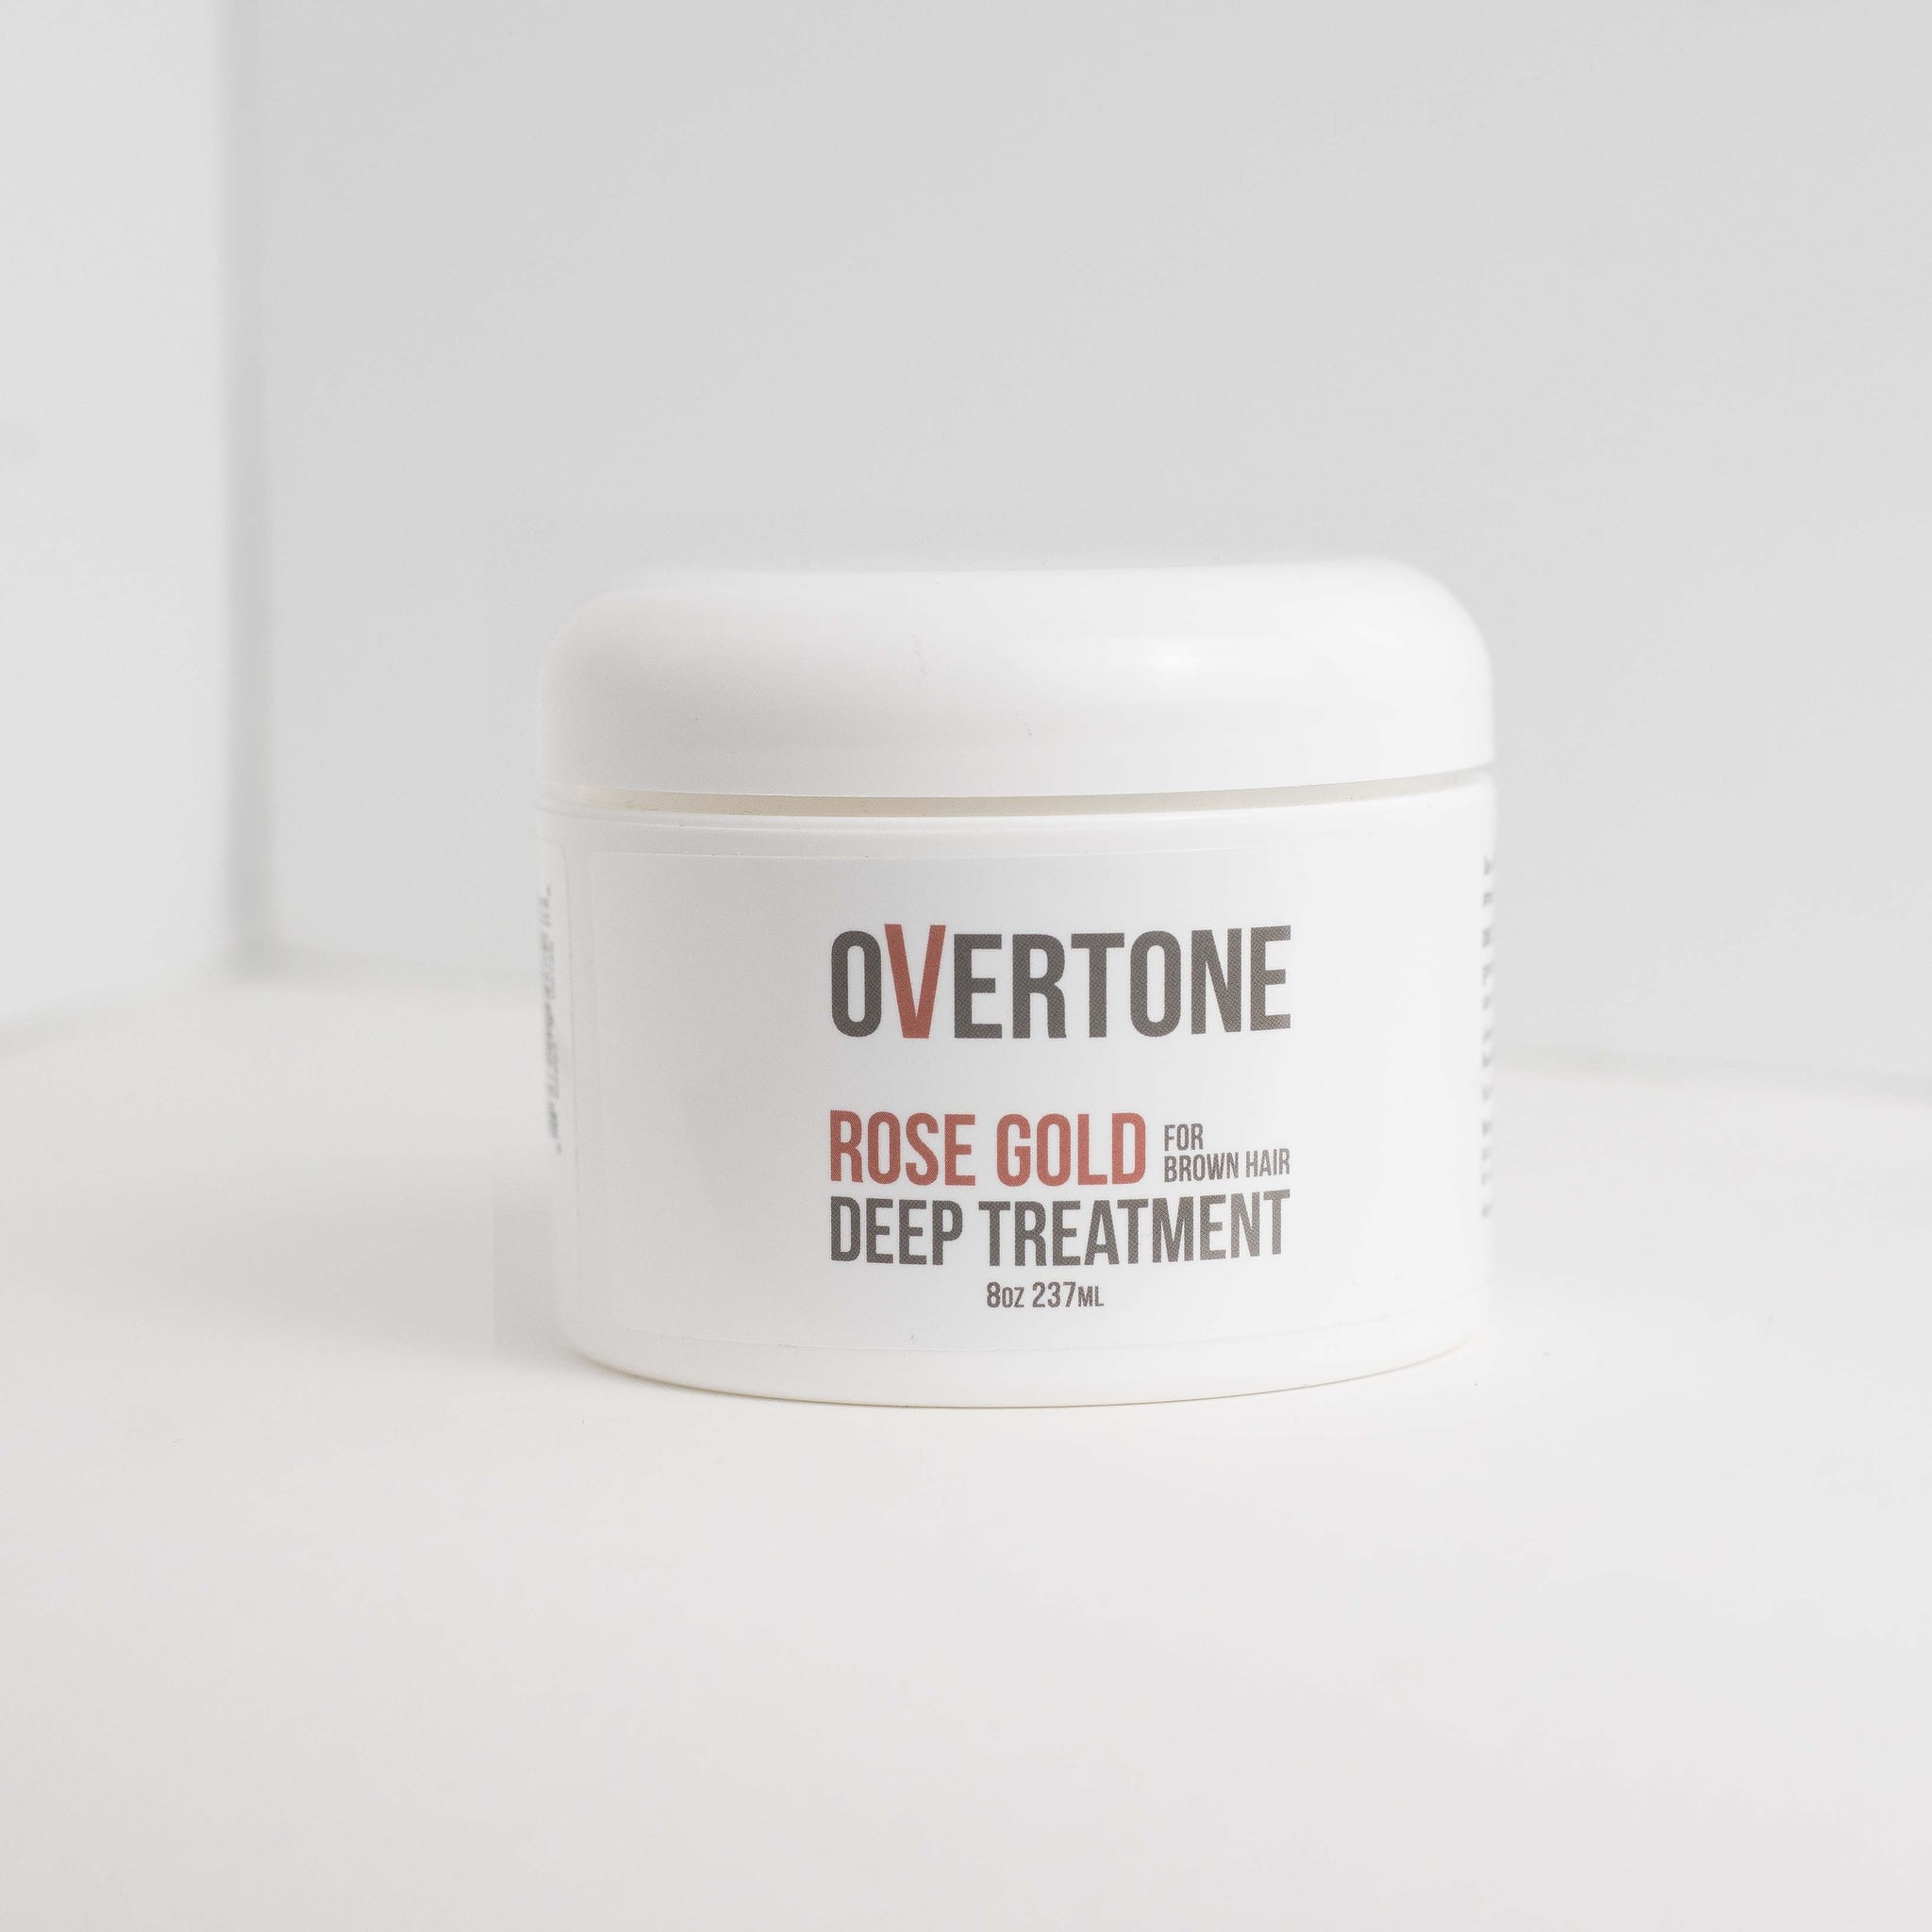 Overtone Rose Gold For Brown Hair Deep Treatment | POPSUGAR Beauty